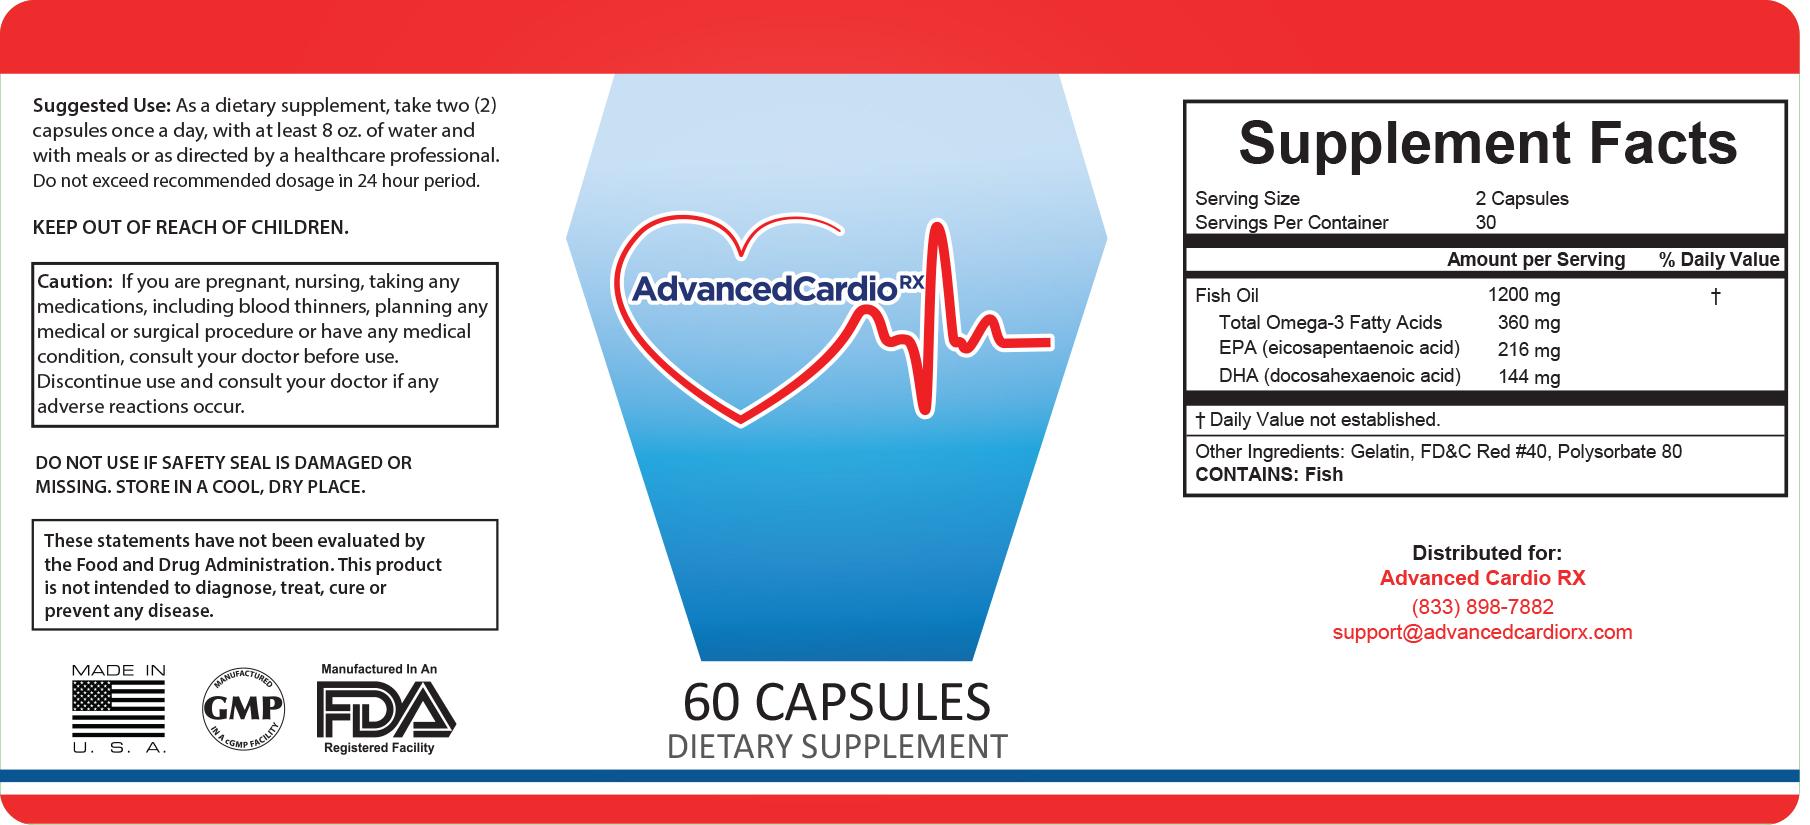 Advanced-CardioRX